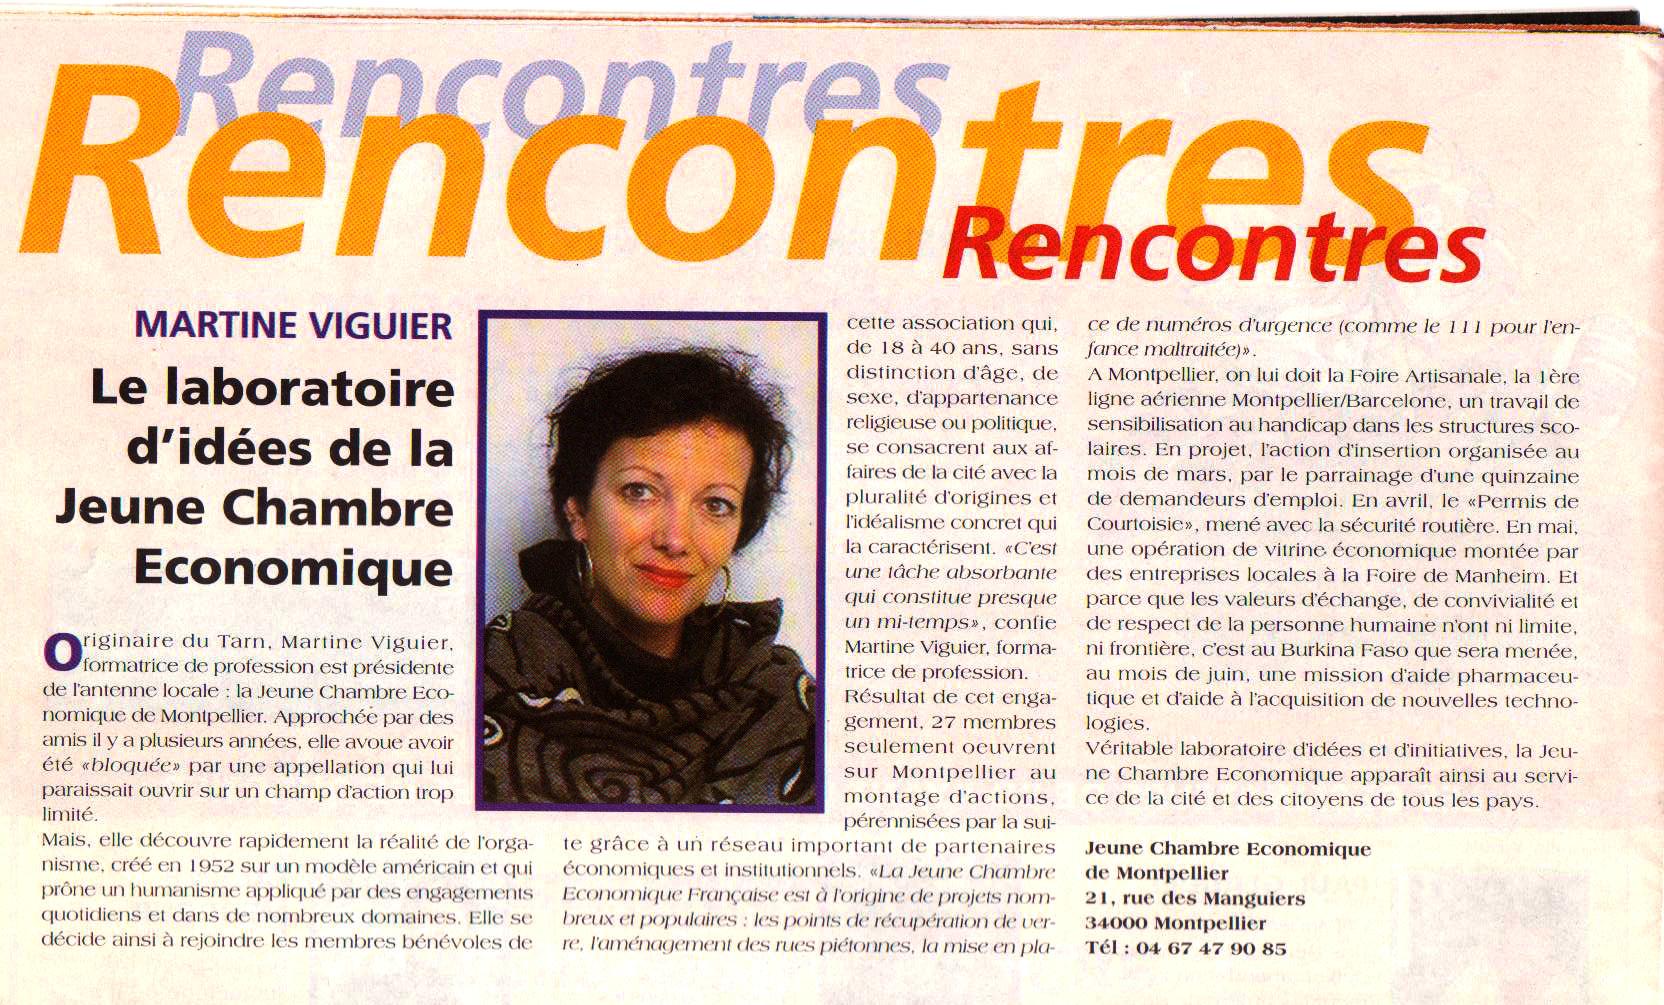 Montpellier Notre Ville, n°204, mars 1997